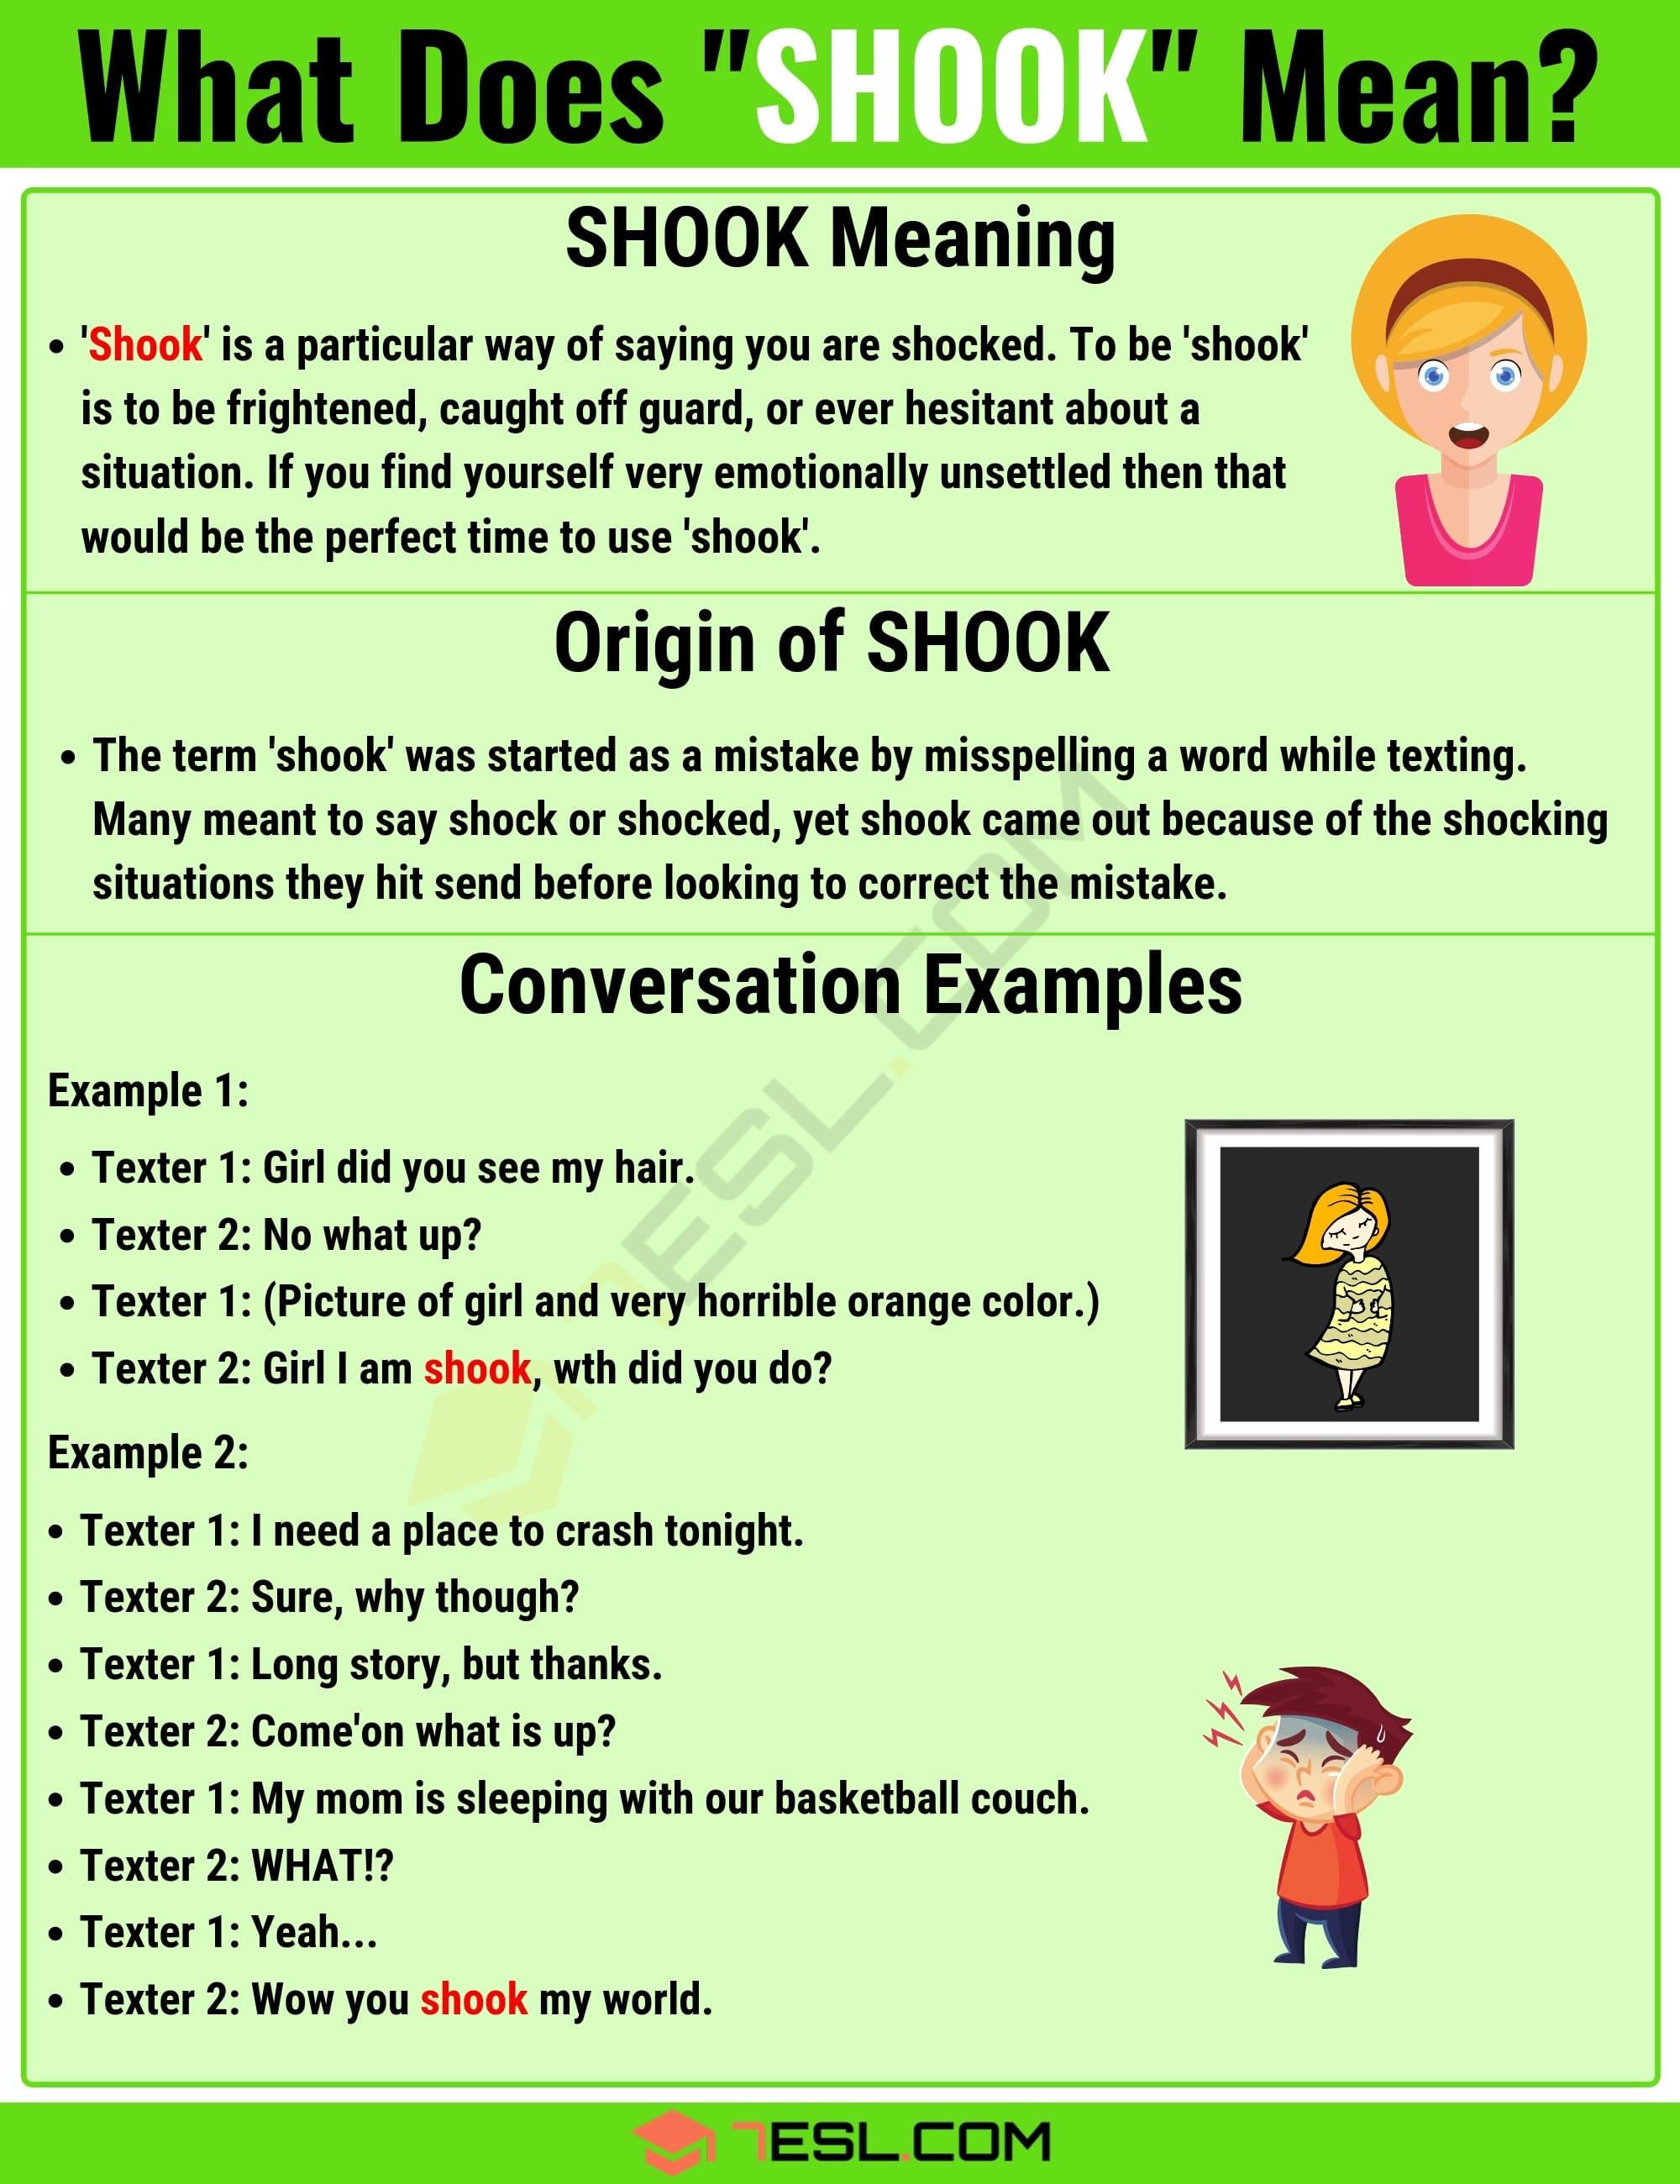 SHOOK